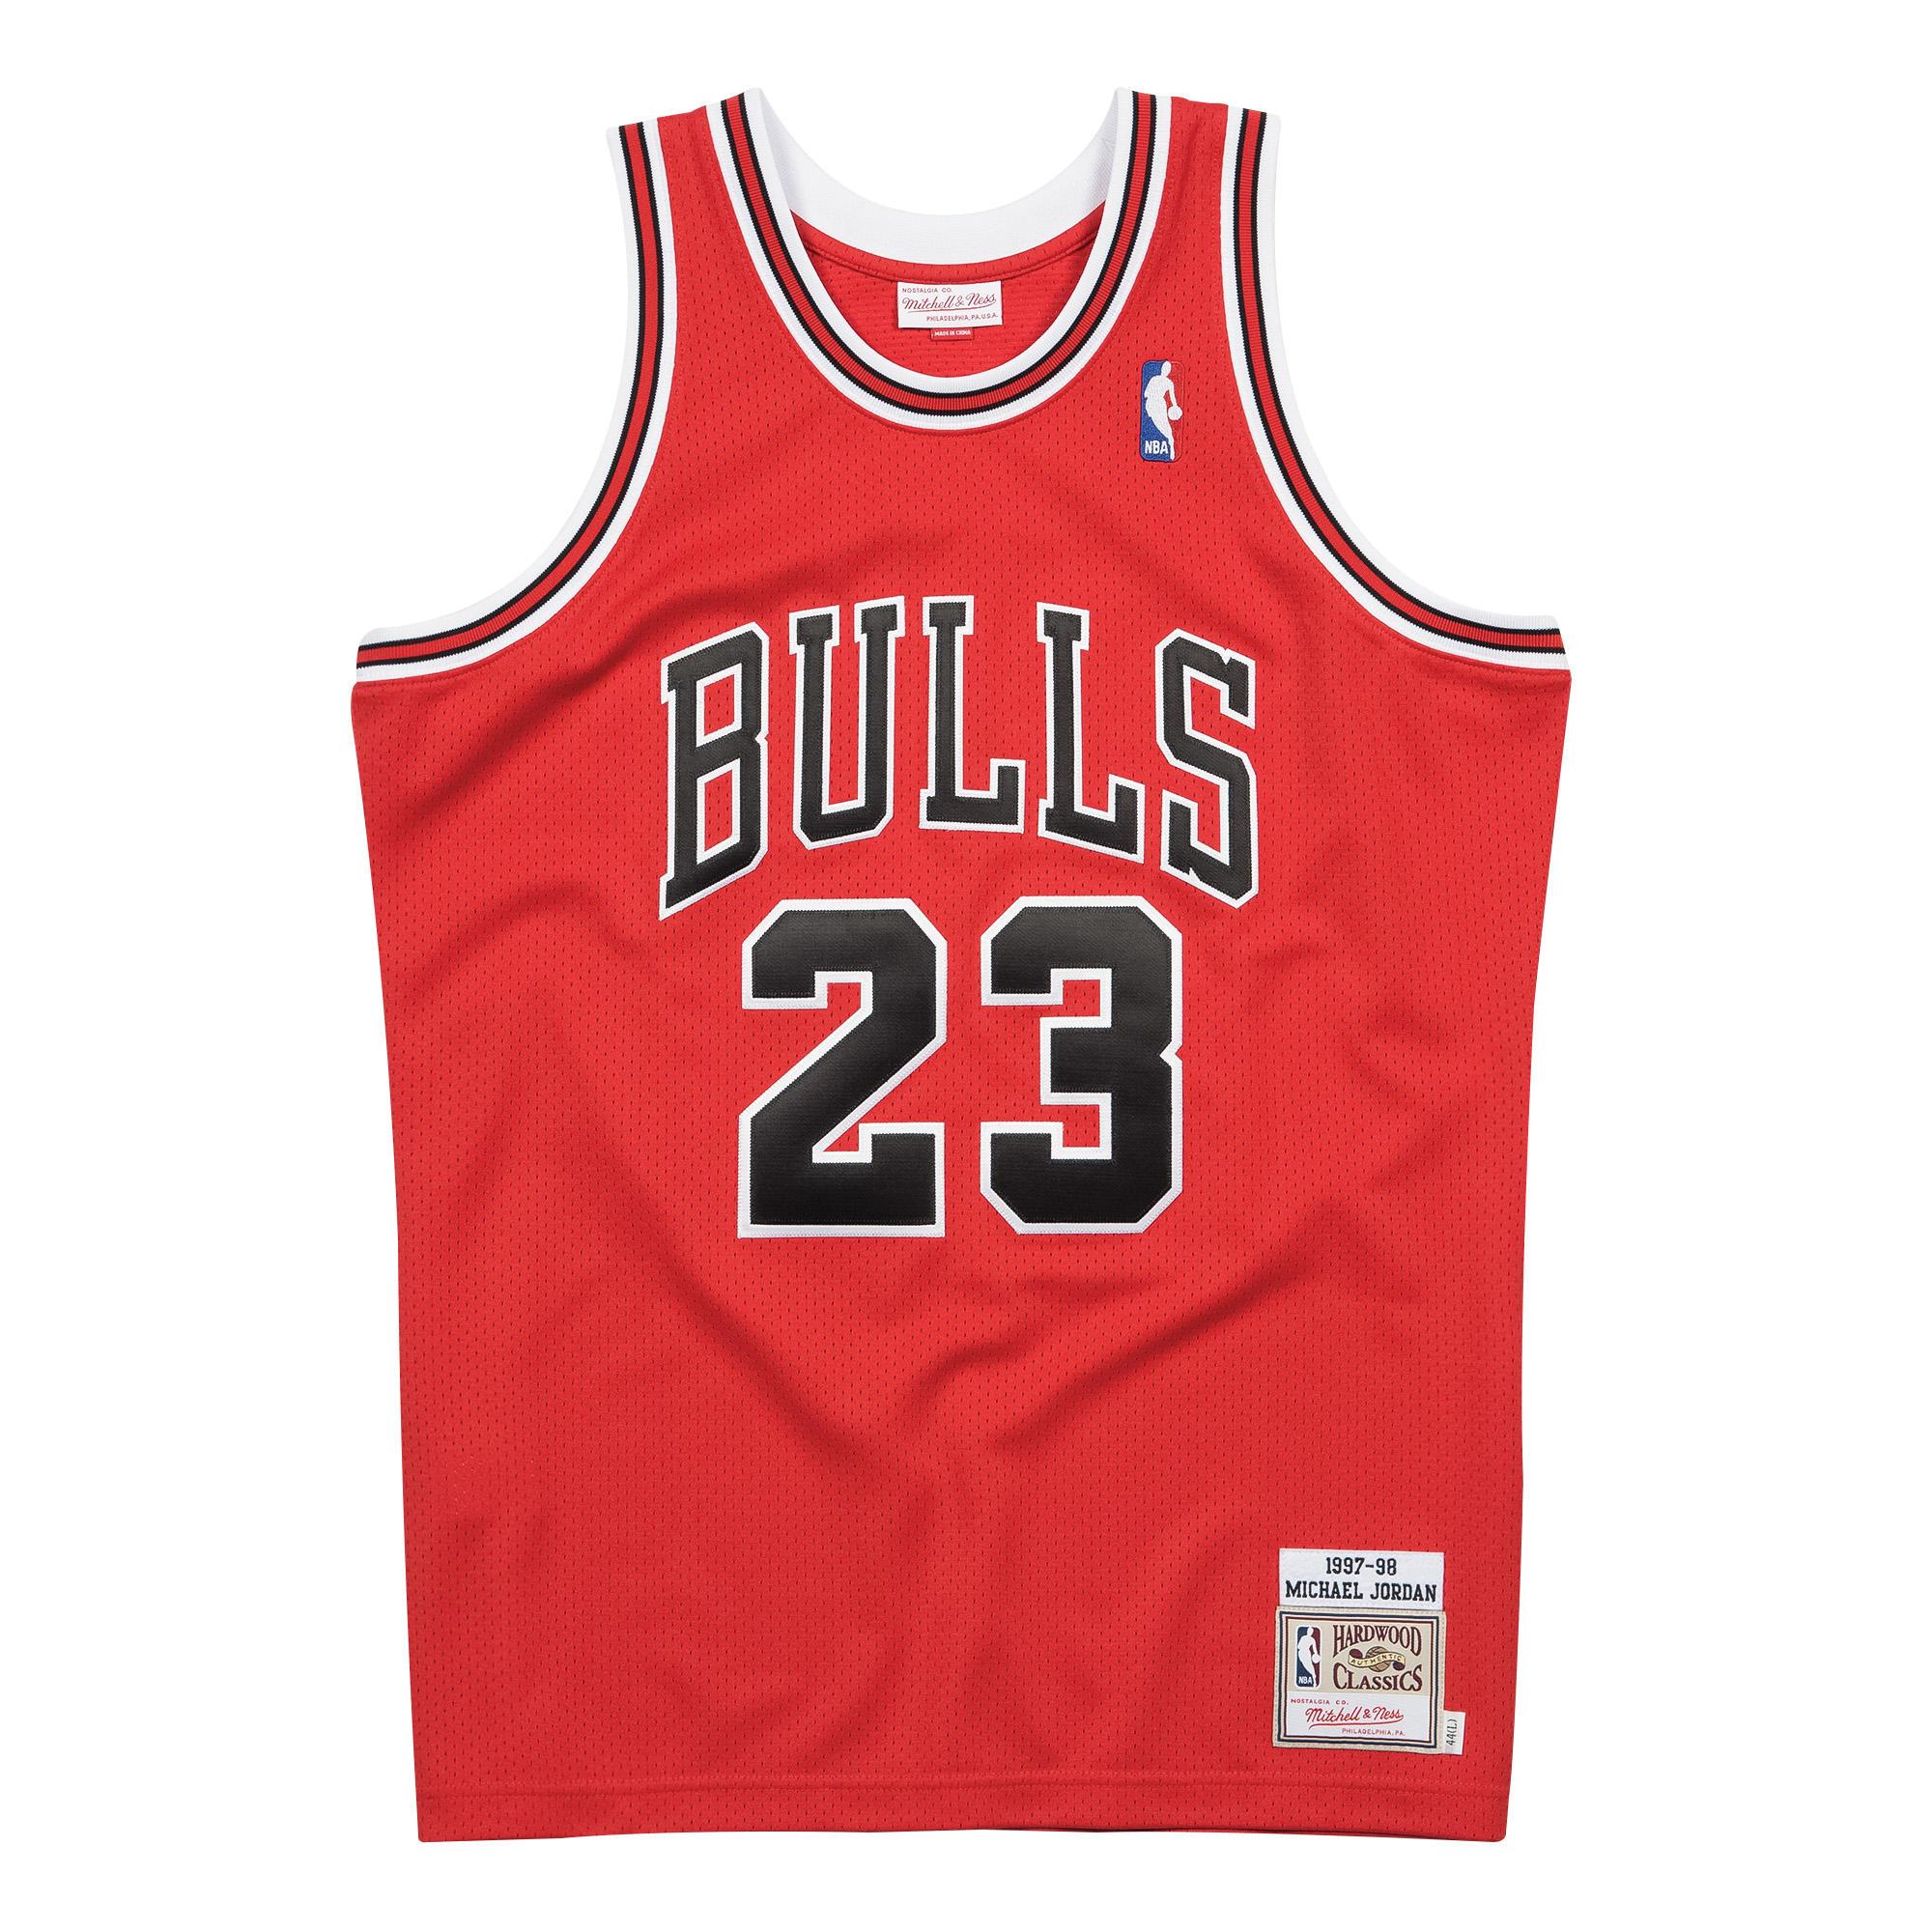 70c555a24e4 Michael Jordan 1997-98 Authentic Jersey Chicago Bulls